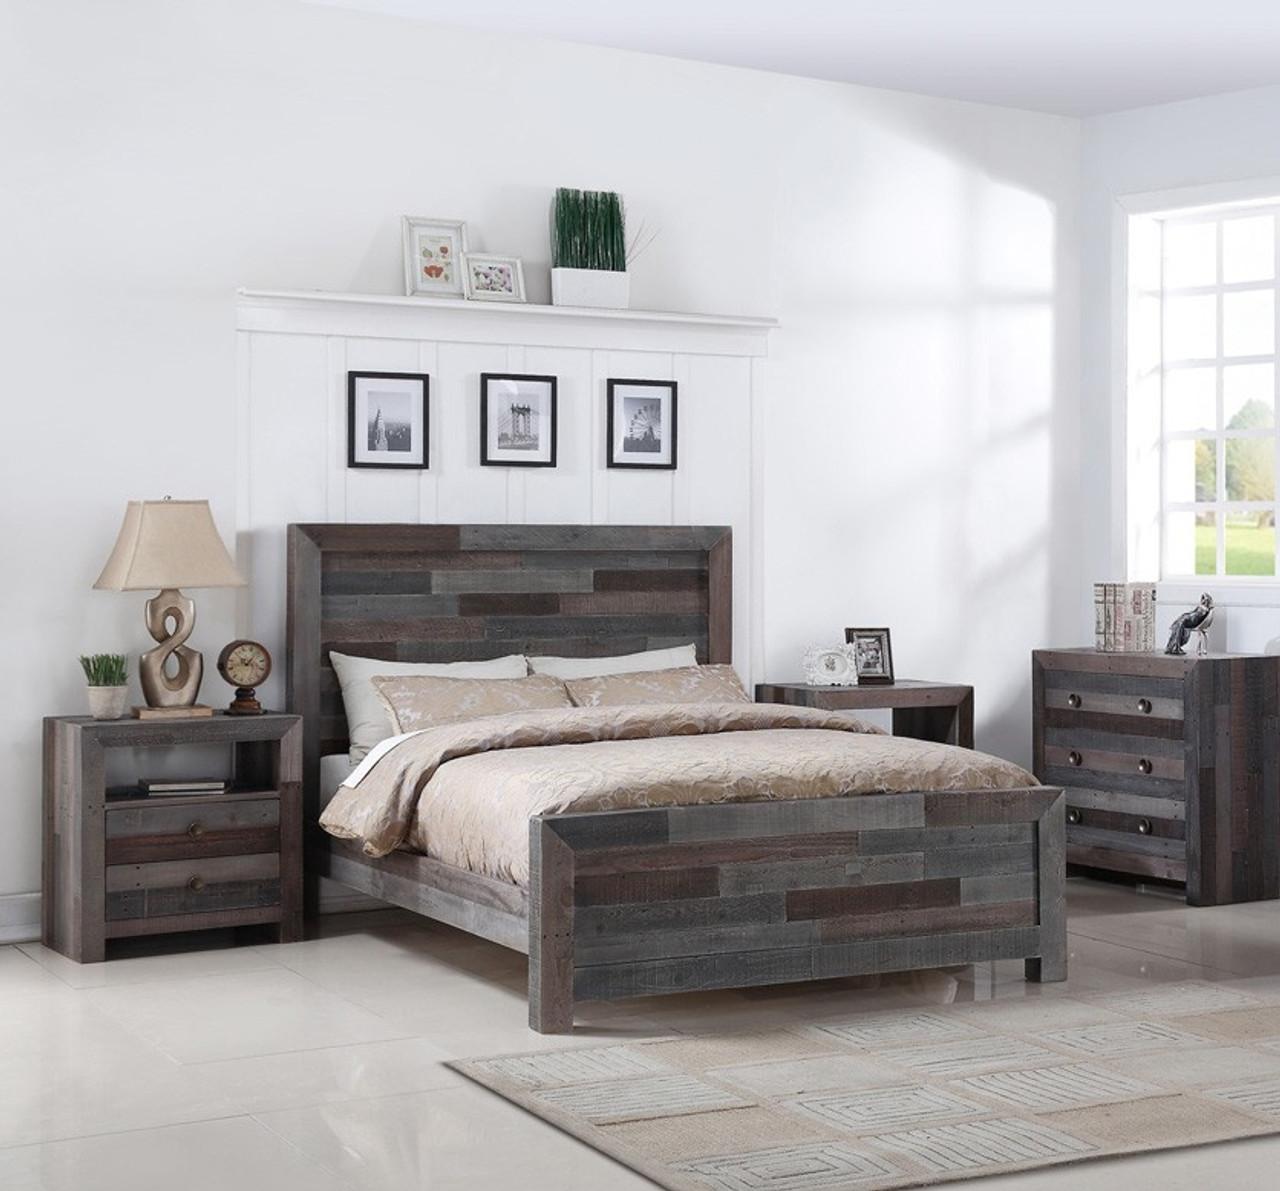 Angora Reclaimed Wood King Size Platform BedStorm Zin Home